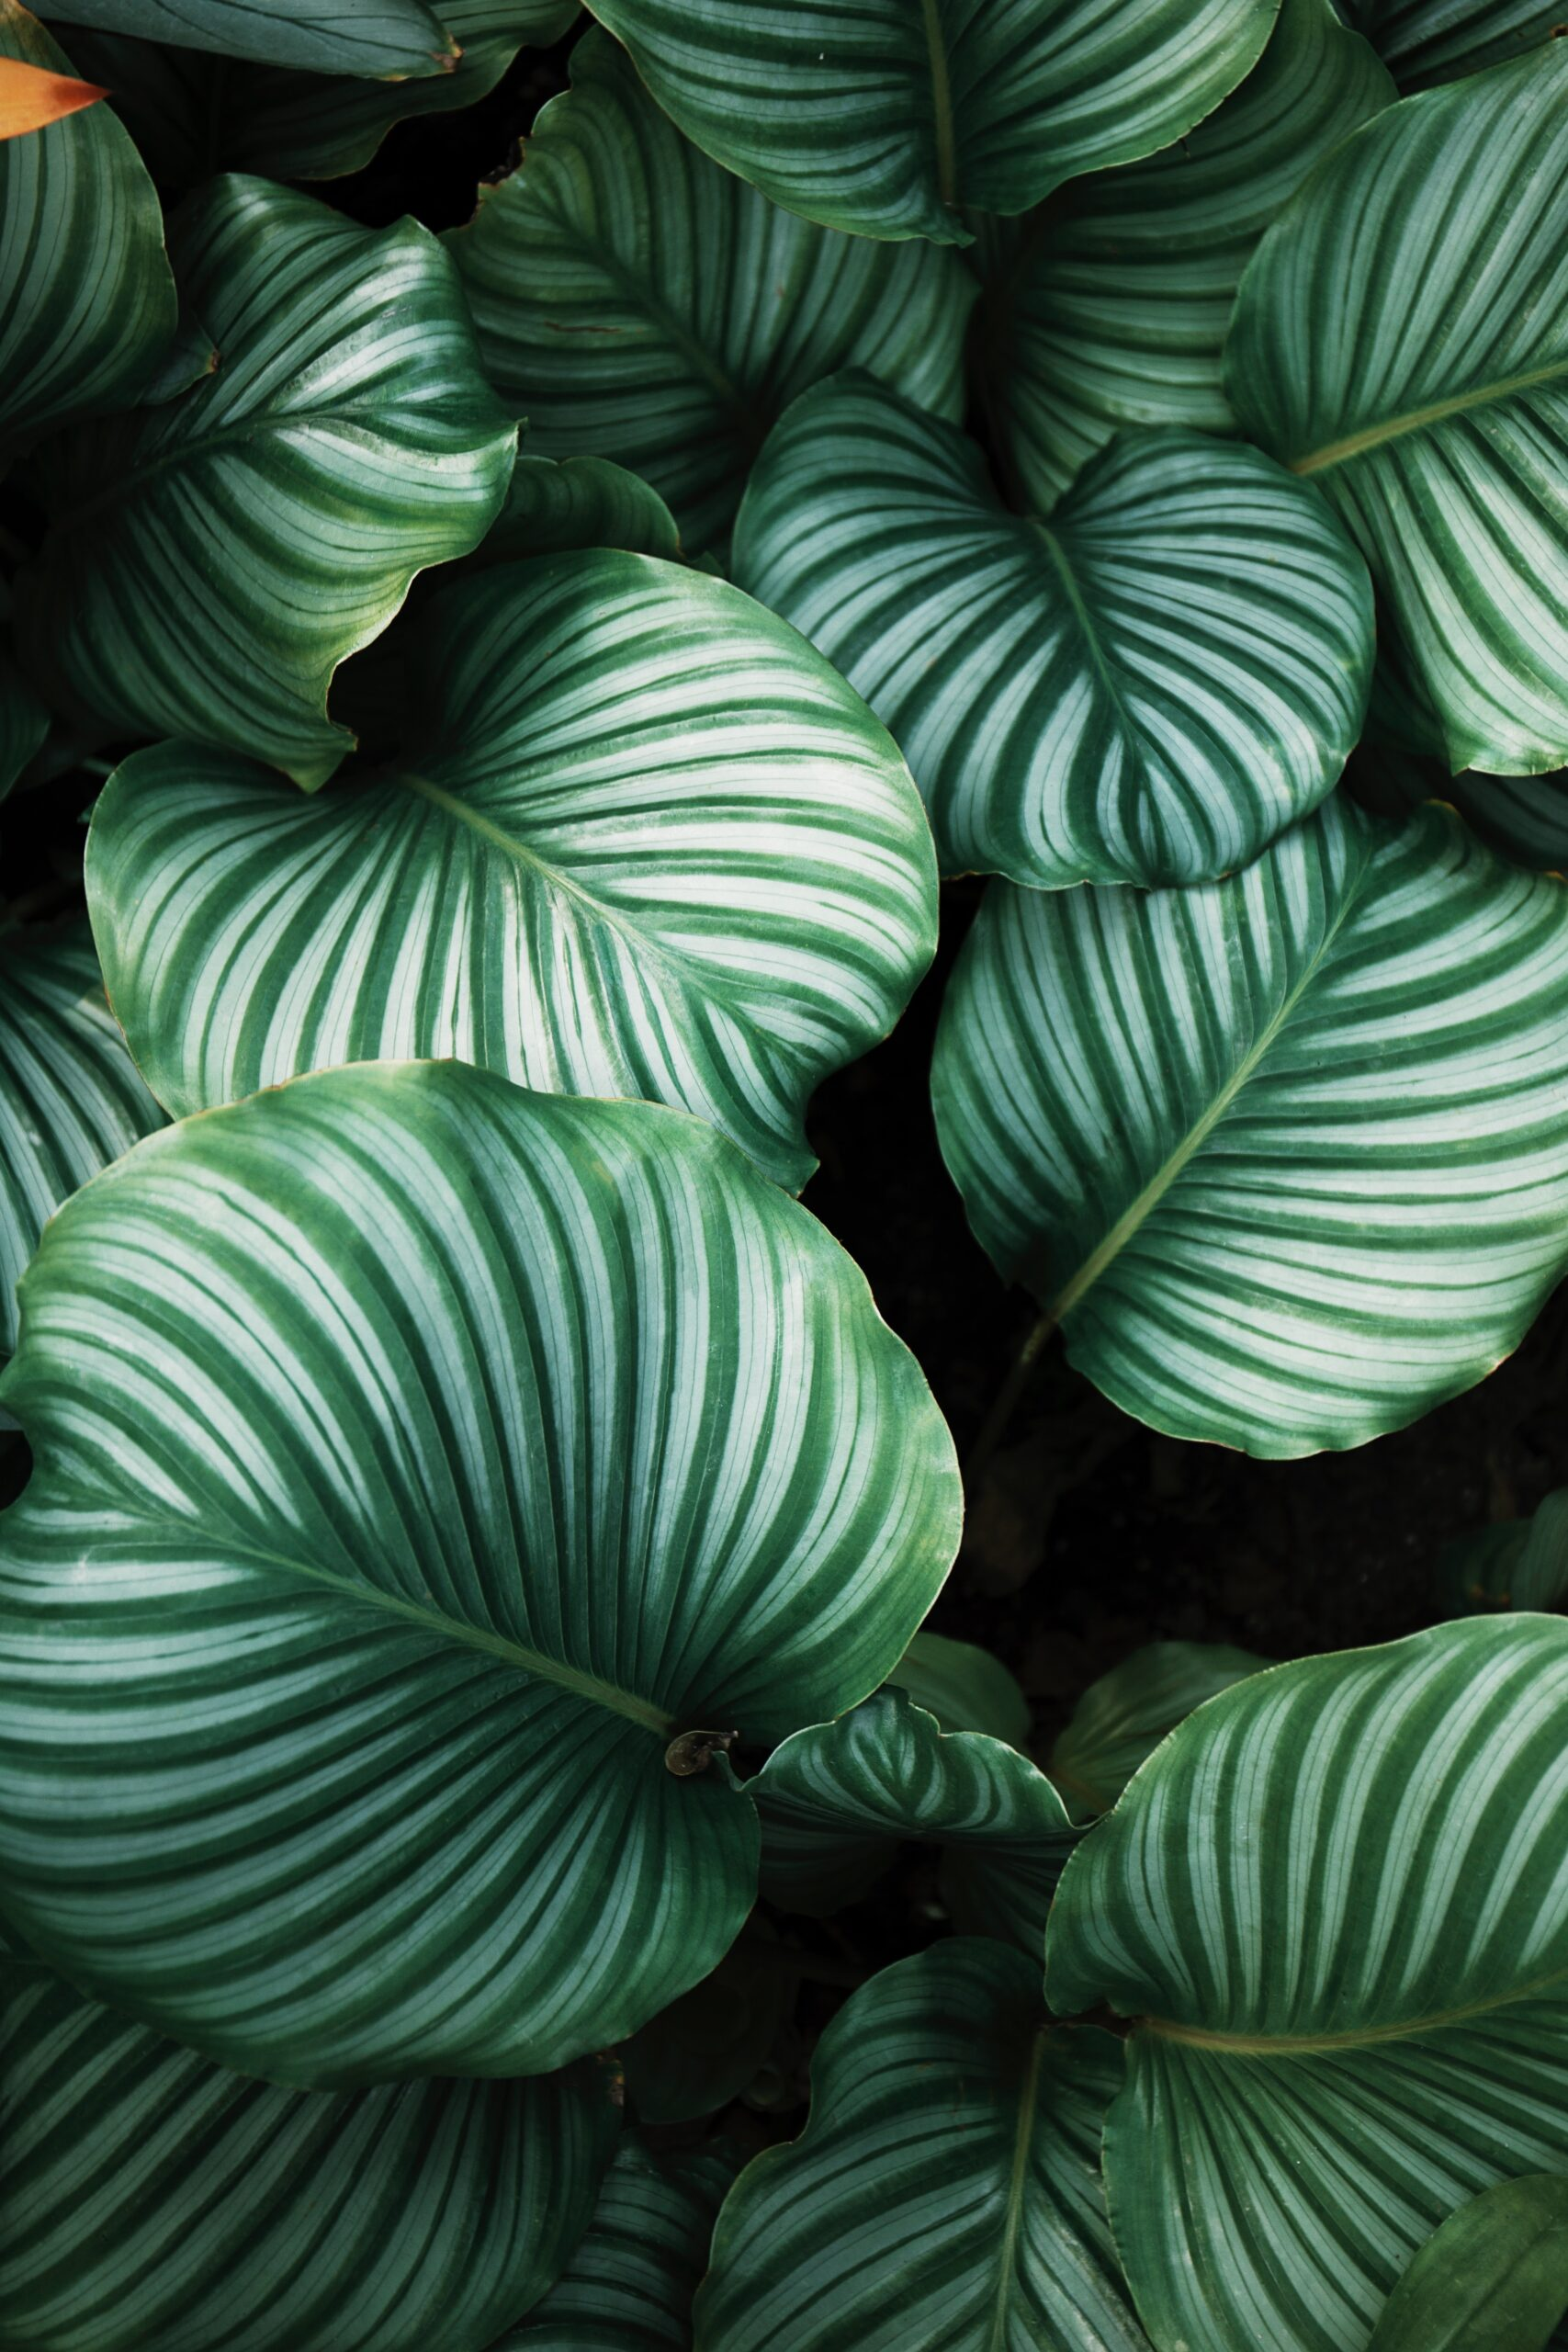 Green plant leaves - Rachel Writes freelance content writer and copywriter